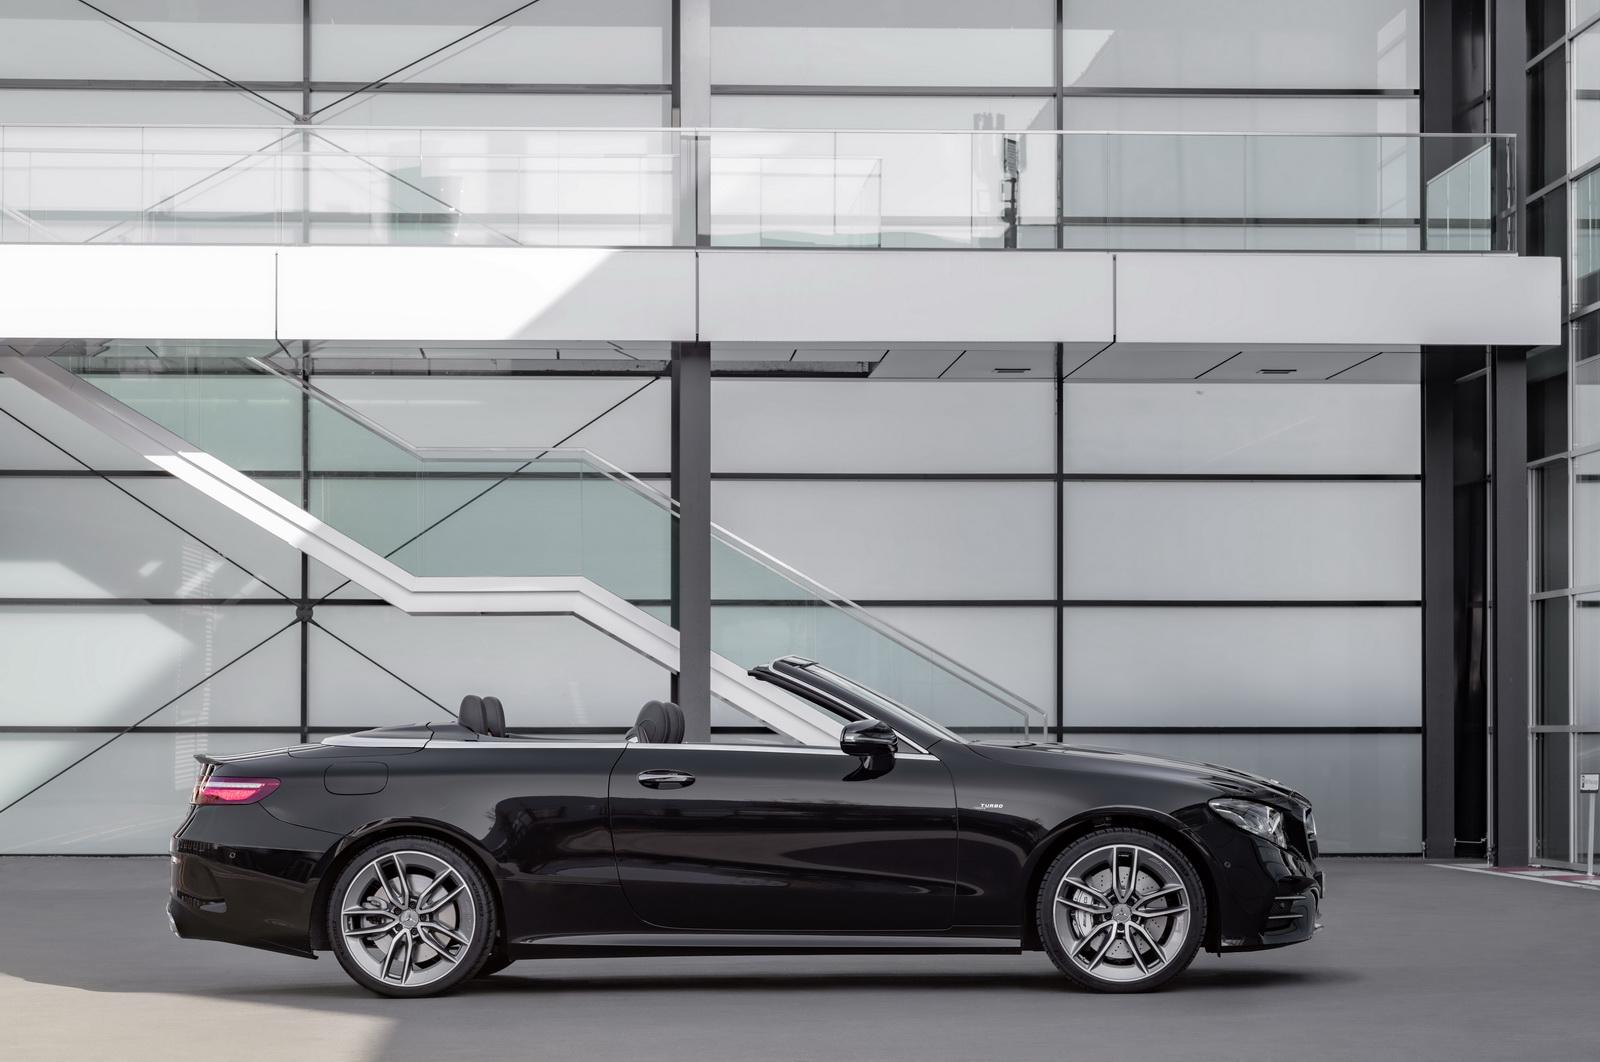 Mercedes-AMG E 53 4MATIC+ CabrioletExterieur: Obsidianschwarz metallic //Exterior: Obsidian black metallic(Kraftstoffverbrauch kombiniert: 8,5 l/100 km; CO2-Emissionen kombiniert: 201 g/km)(fuel consumption combined: 8.5 l/100 km; CO2 emissions combined: 201 g/km)